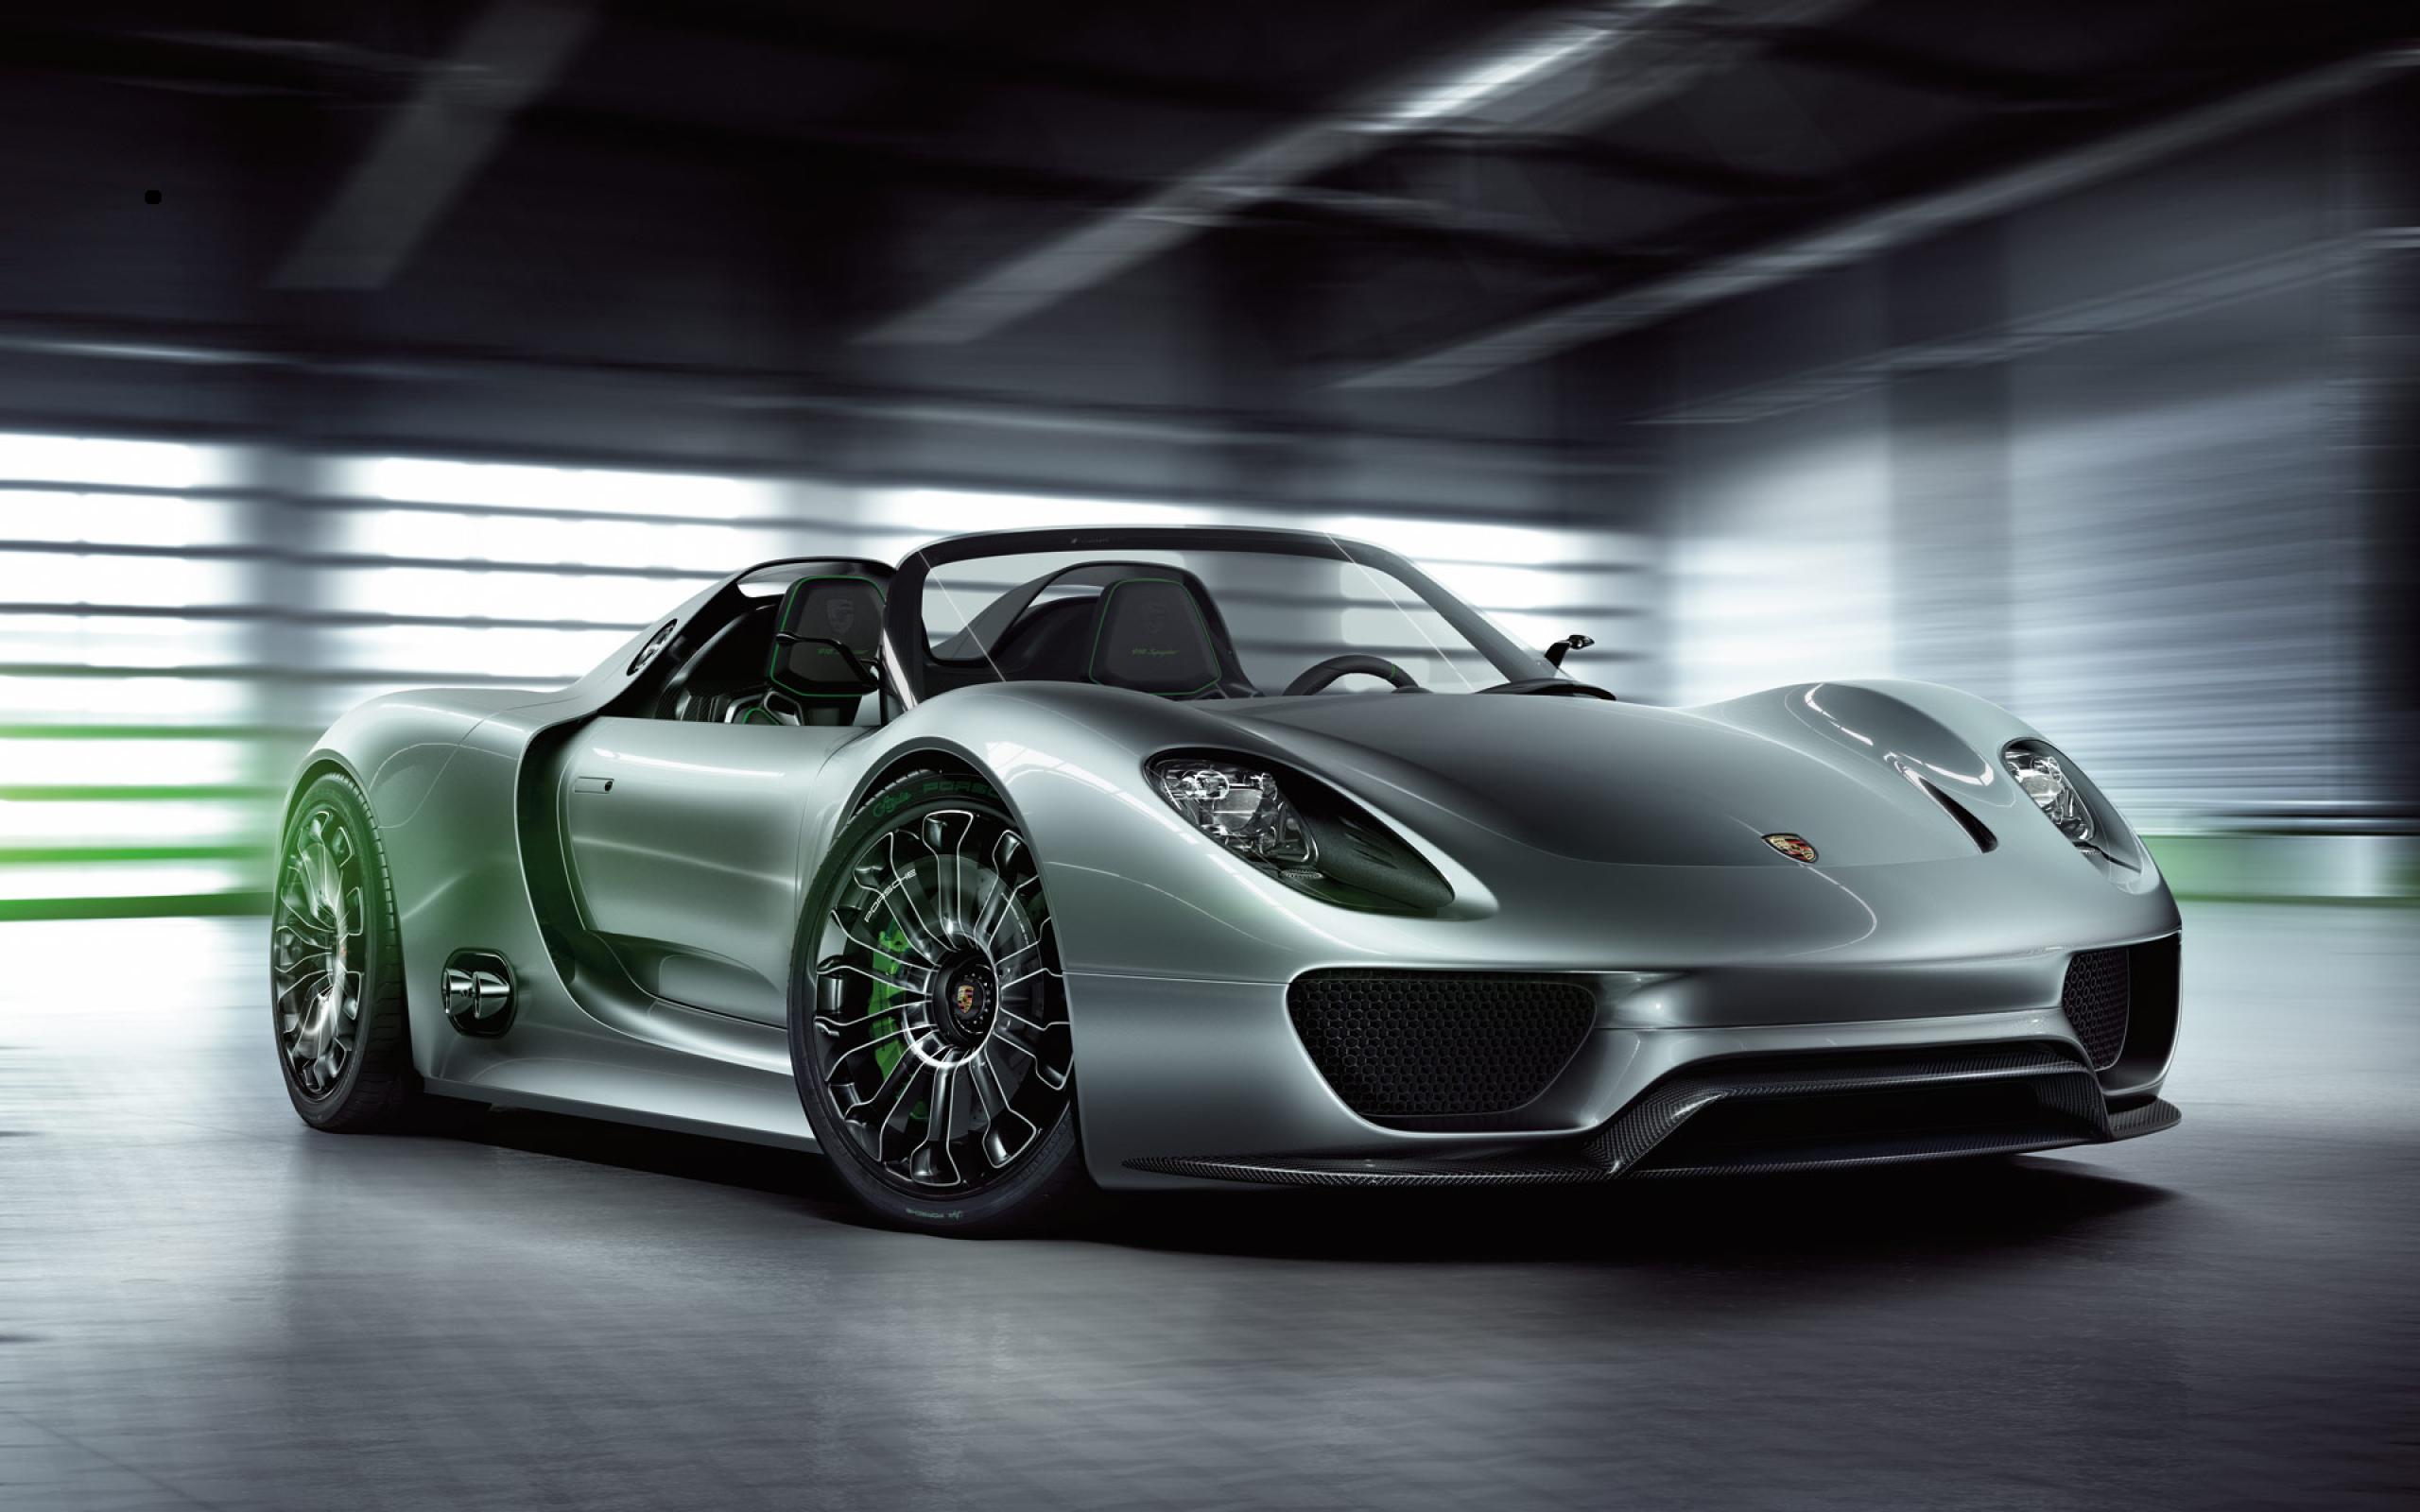 Porsche Png Images Free Download